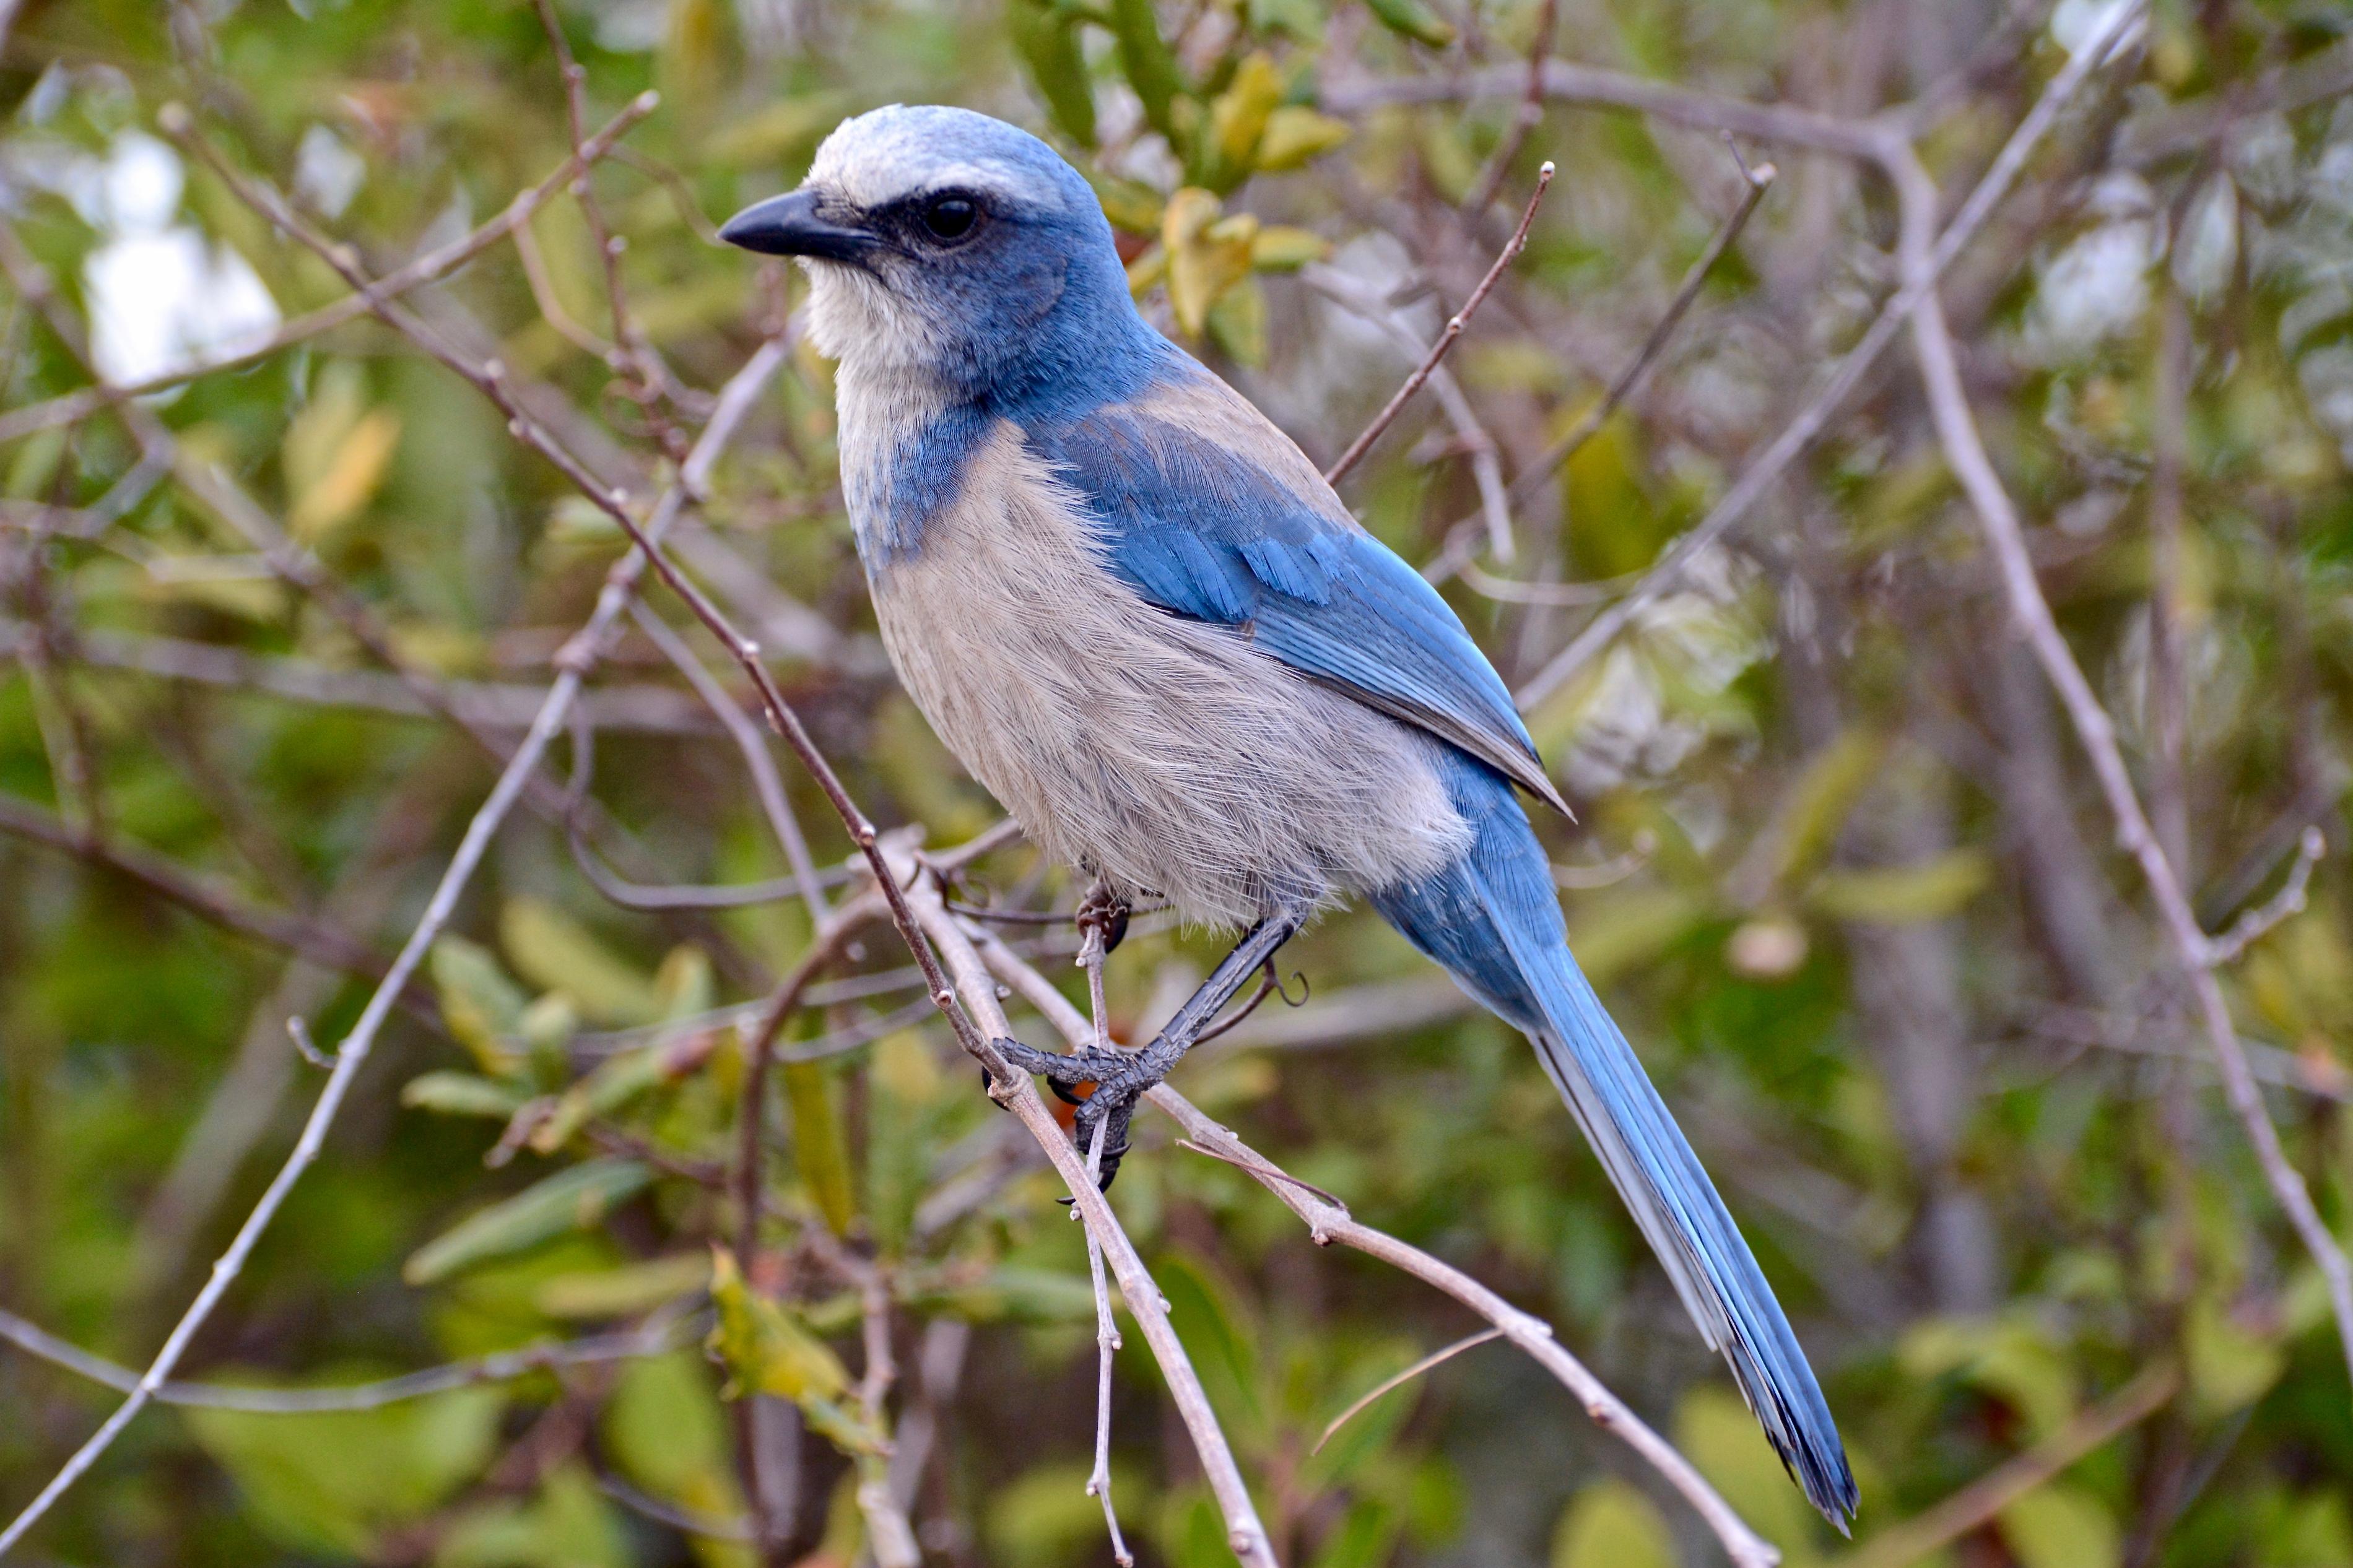 Florida Scrub-Jay. Photo: Ann Foster/Great Backyard Bird Count.